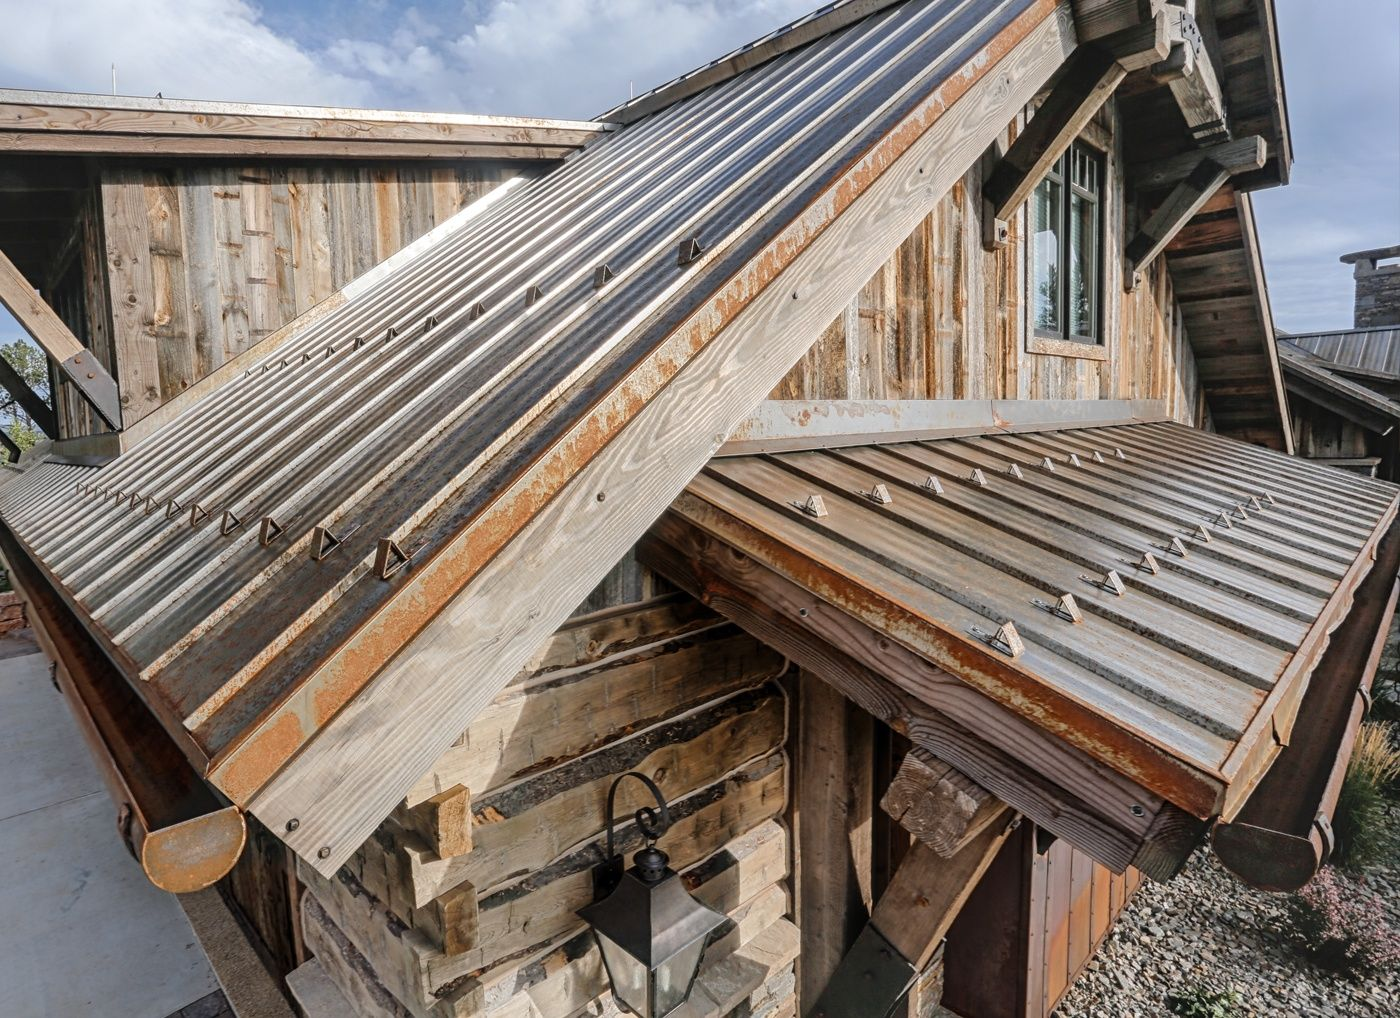 Corten Standing Seam Metal Roof Standing Seam Metal Roof Standing Seam Roof Metal Roof